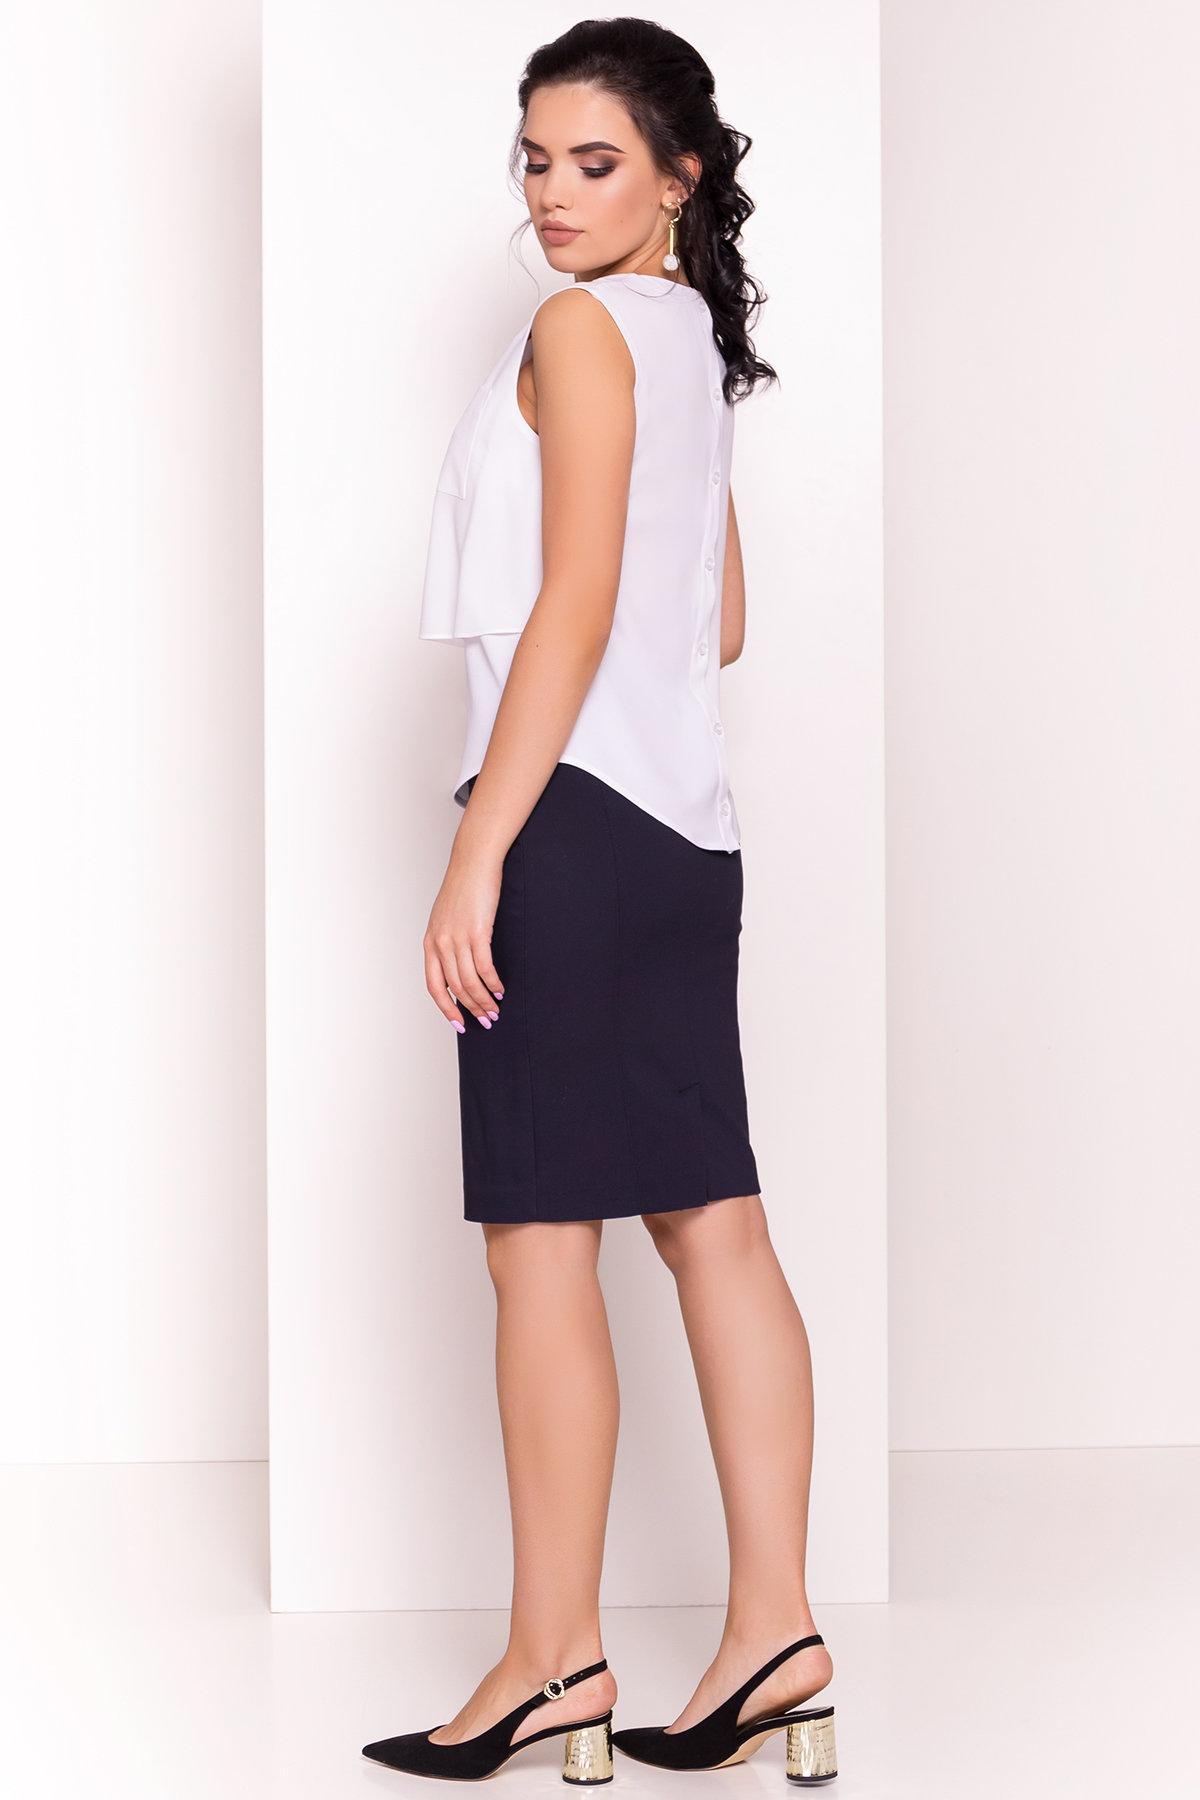 Блуза Девайс 5269 Цвет: Белый